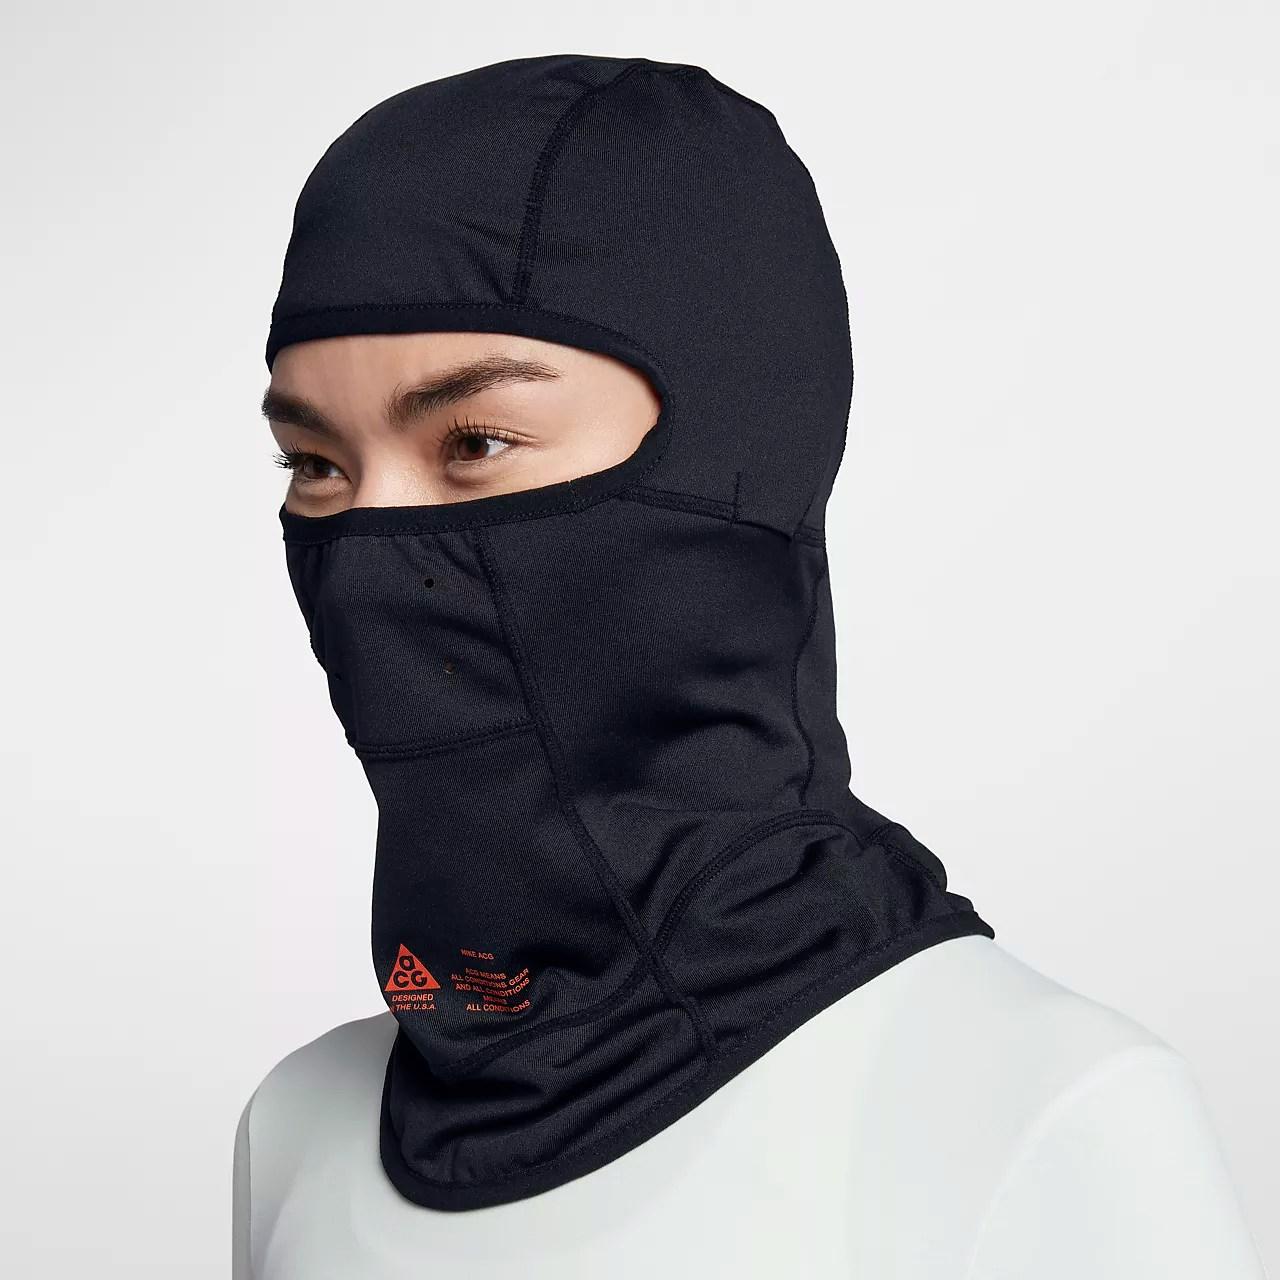 NikeLab ACG 男/女巴拉克拉法帽-耐克(Nike)中國官網